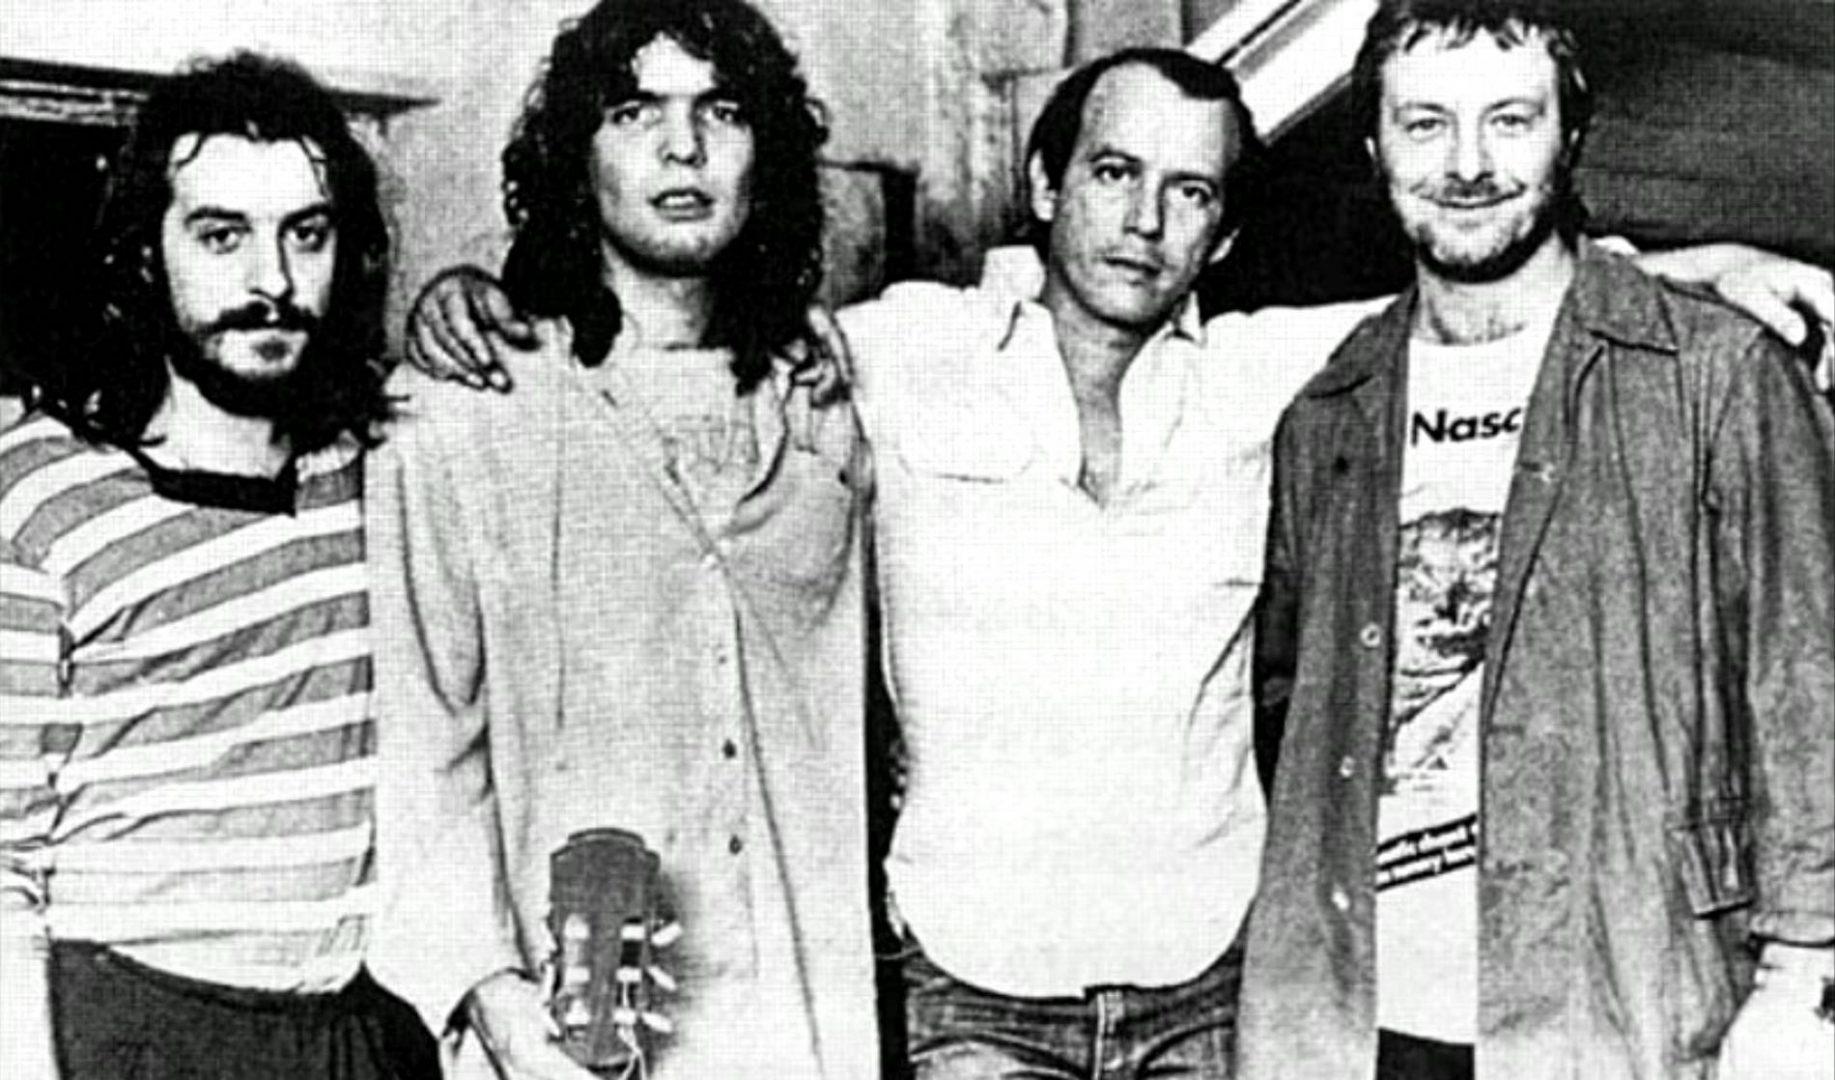 From left to right: Juan Carlos Baglietto, Santiago Feliú, Silvio Rodríguez and Leon Gieco.